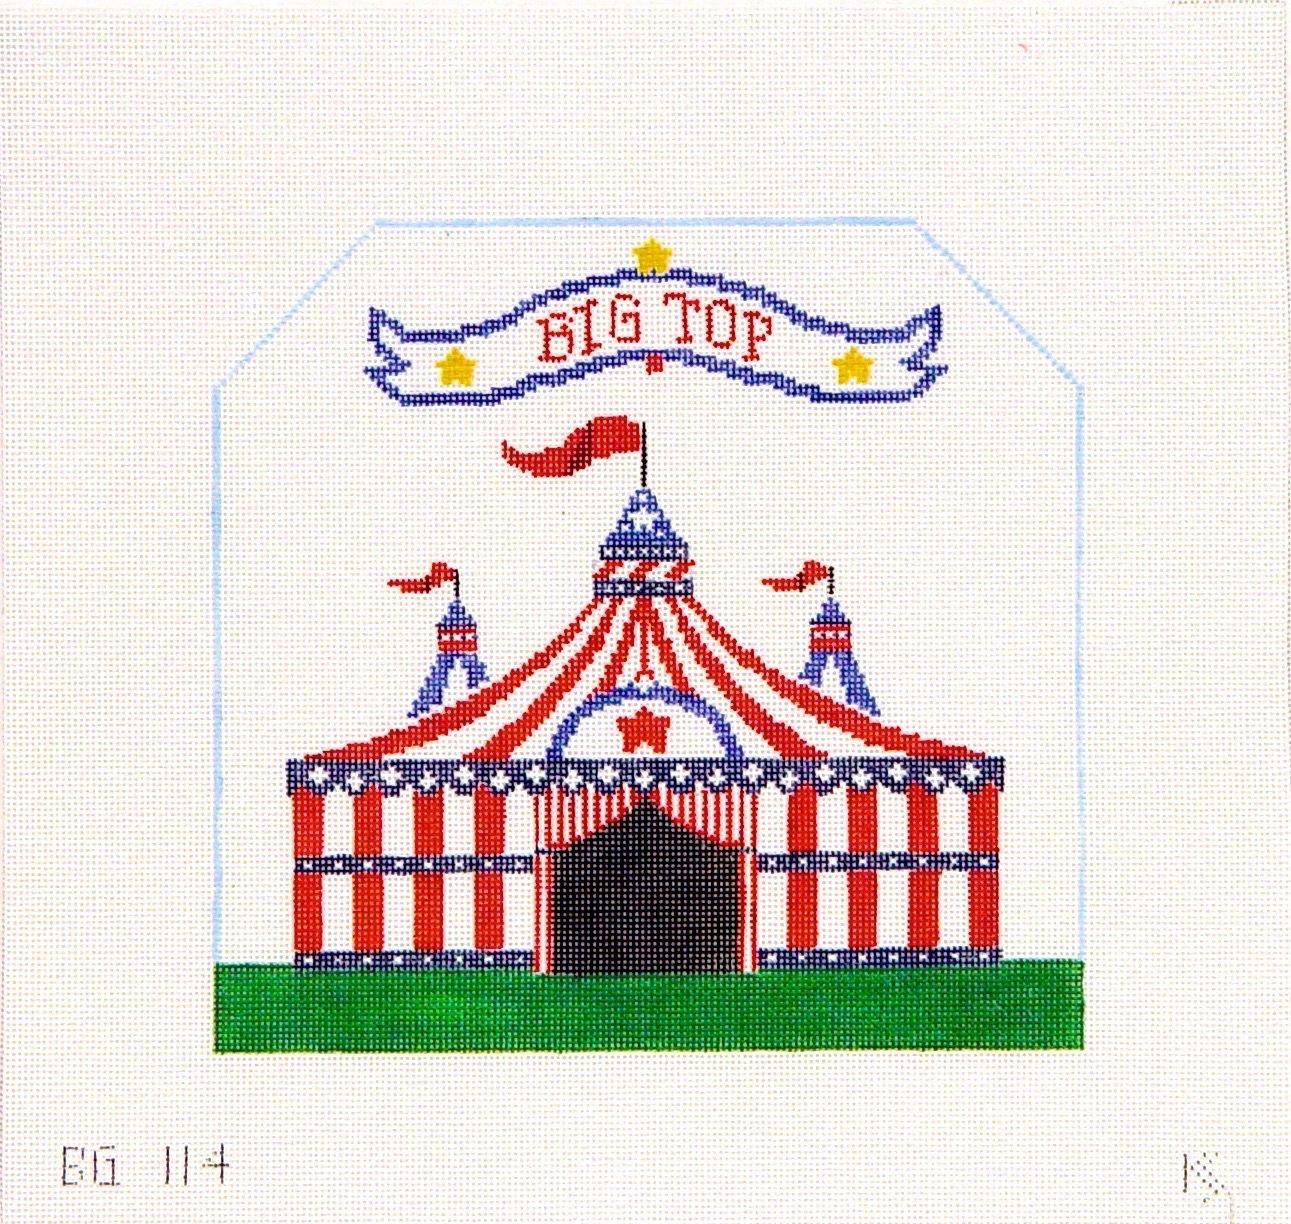 BG114 Big Top Circus